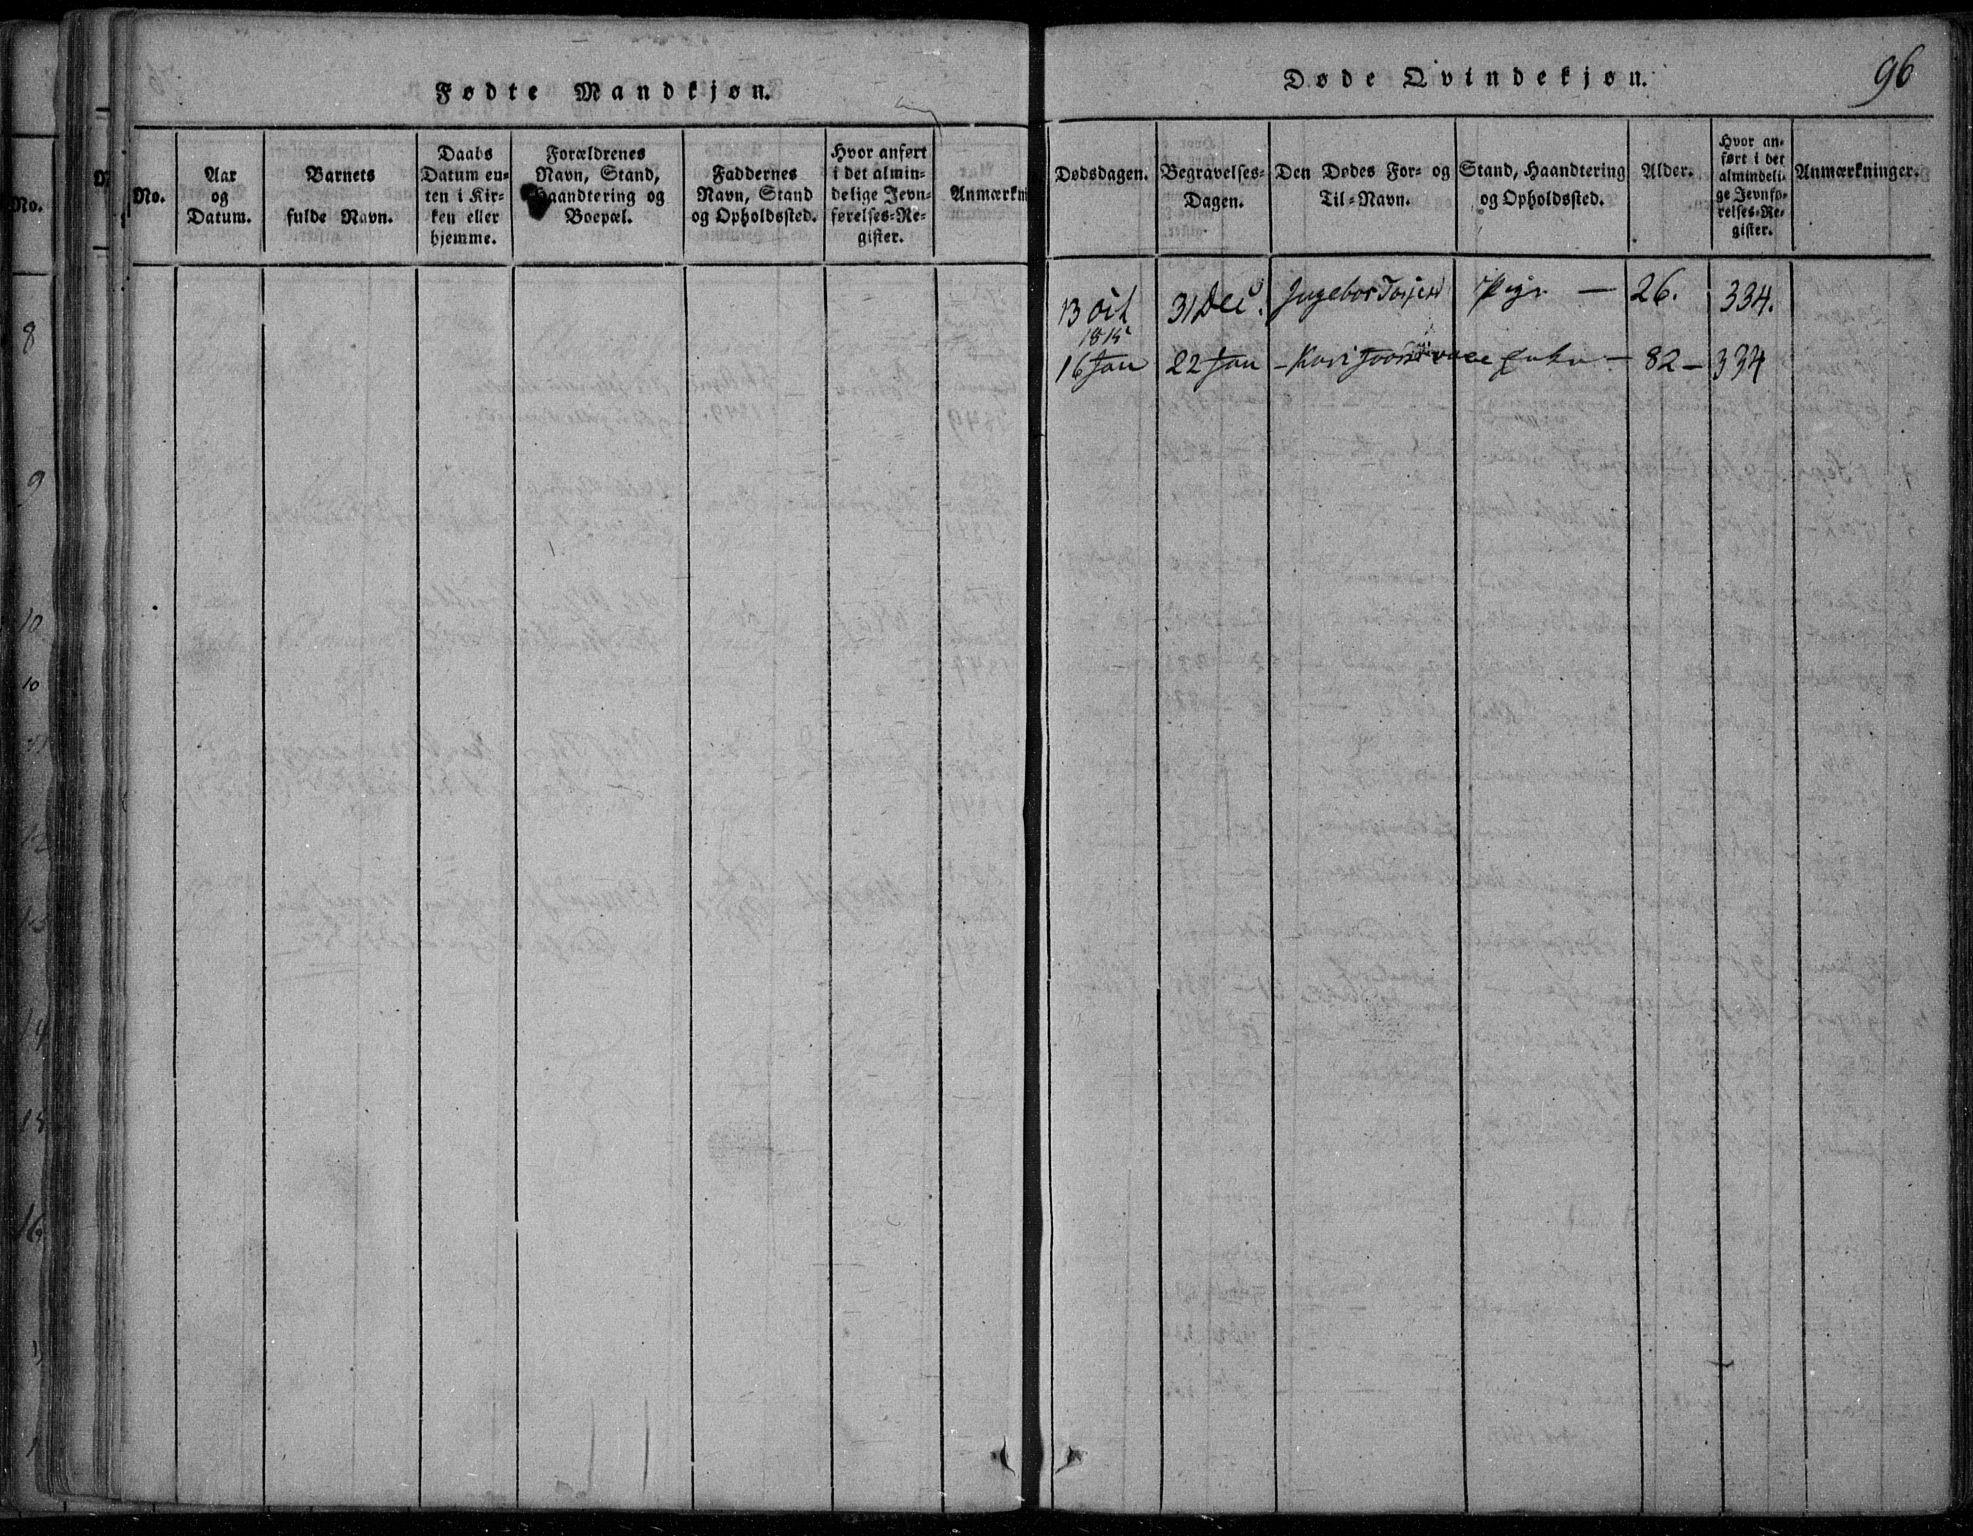 SAKO, Rauland kirkebøker, F/Fa/L0001: Ministerialbok nr. 1, 1814-1859, s. 96